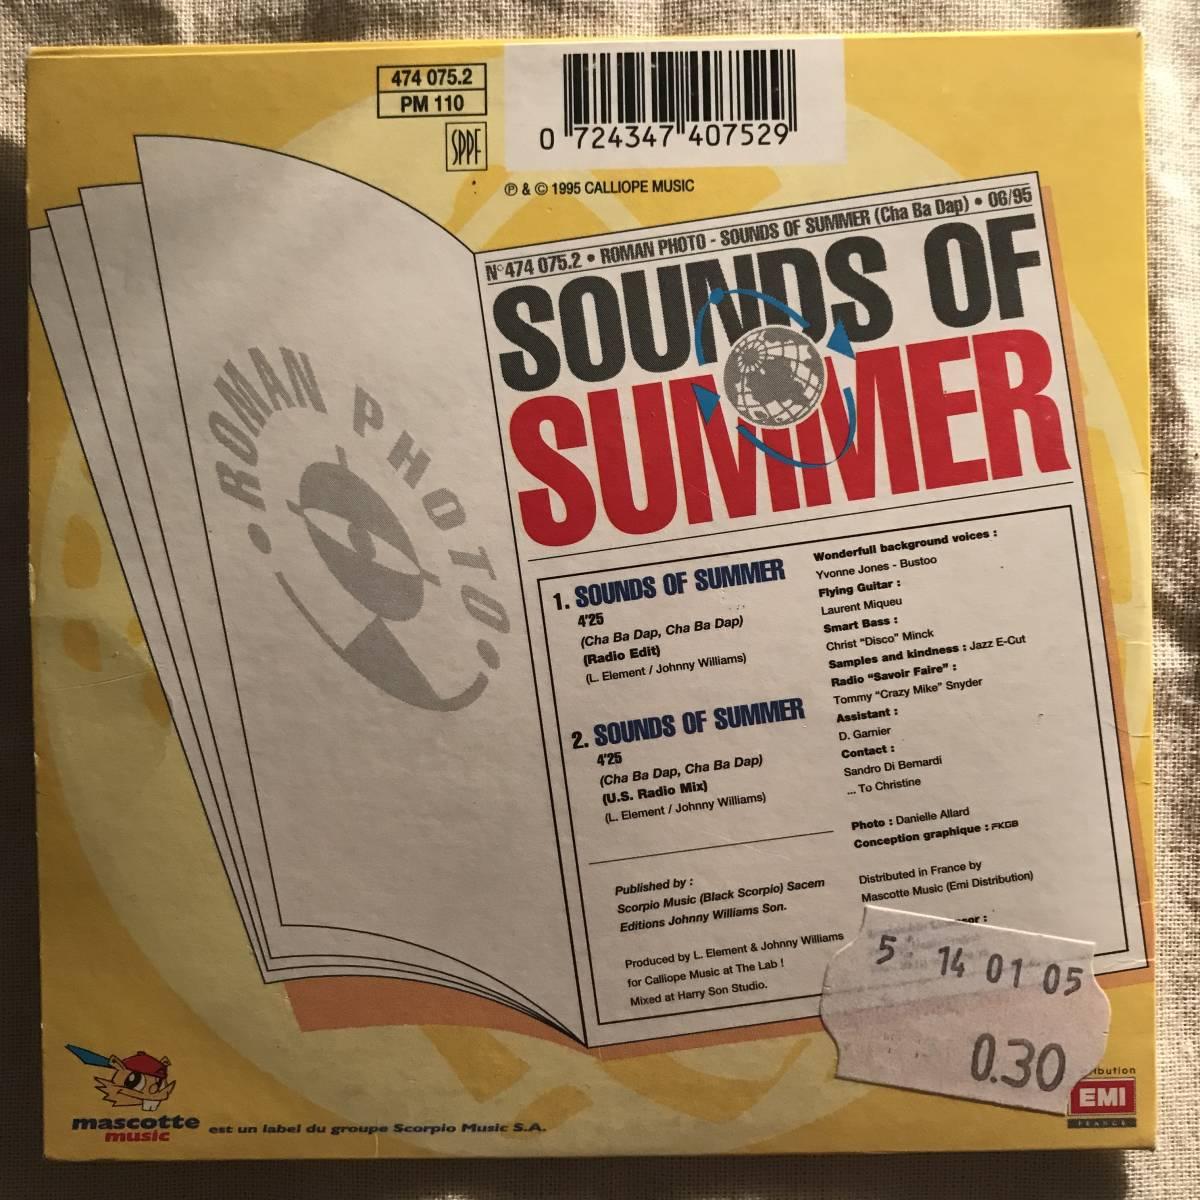 【CD Single】Roman Photo/Sound Of Summer